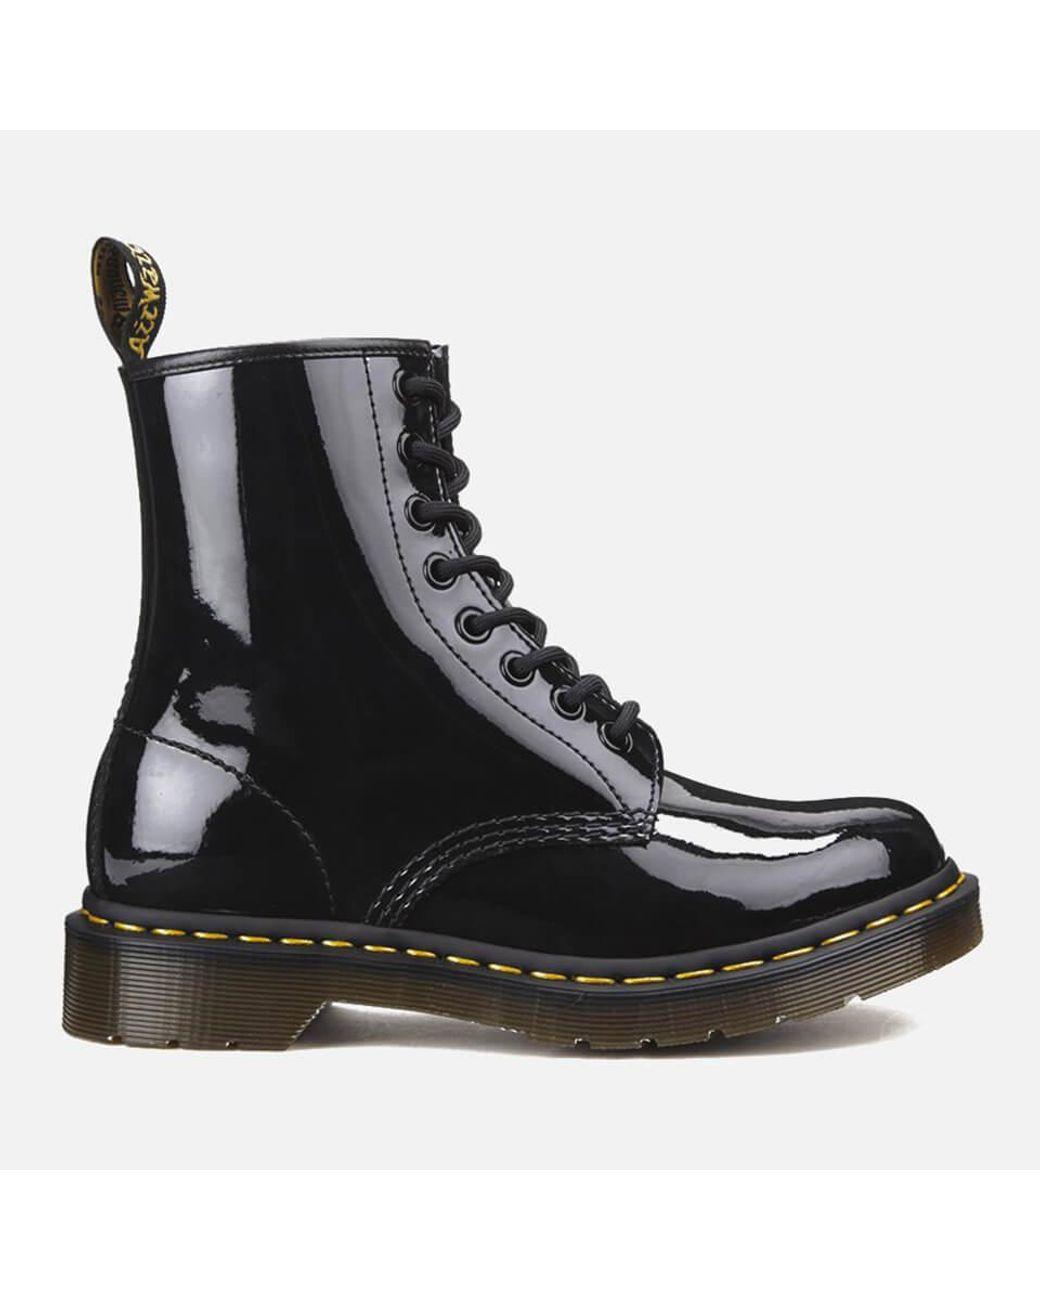 1460 Patent Lamper 8-eye Boots in Black